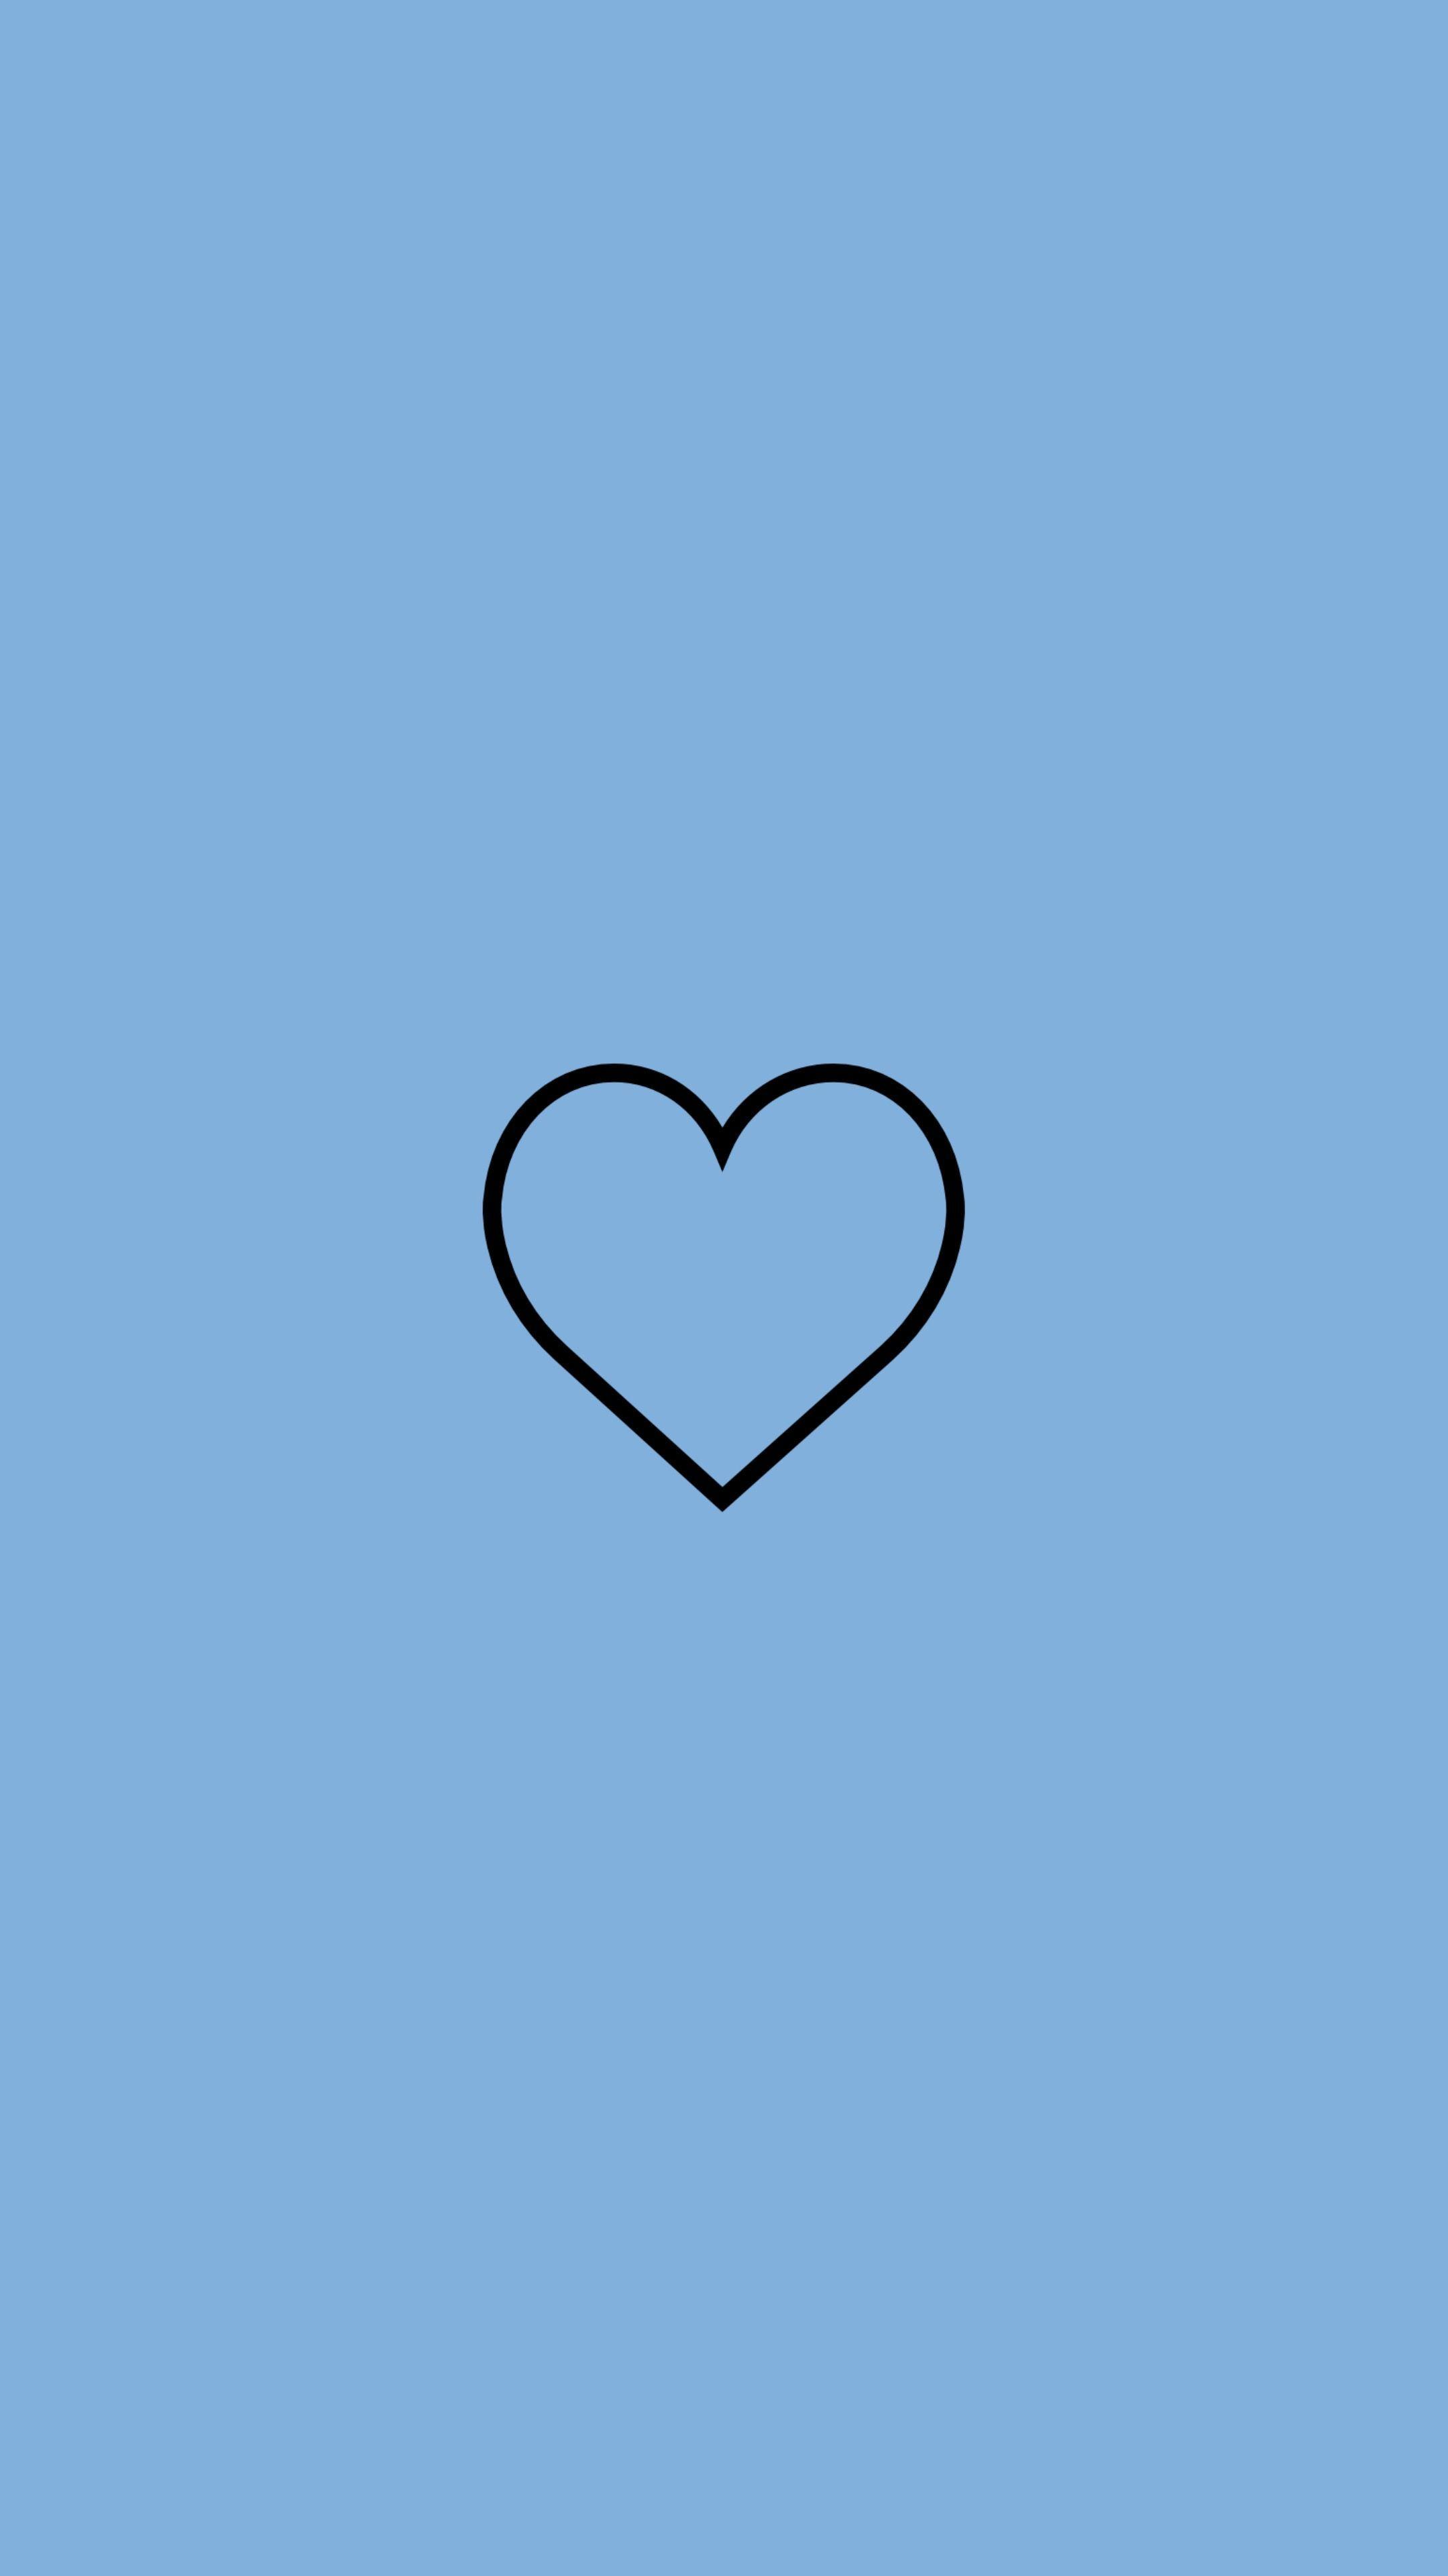 Blue Wallpaper Iphone Instagram Logo Instagram Icons Instagram Highlight Icons